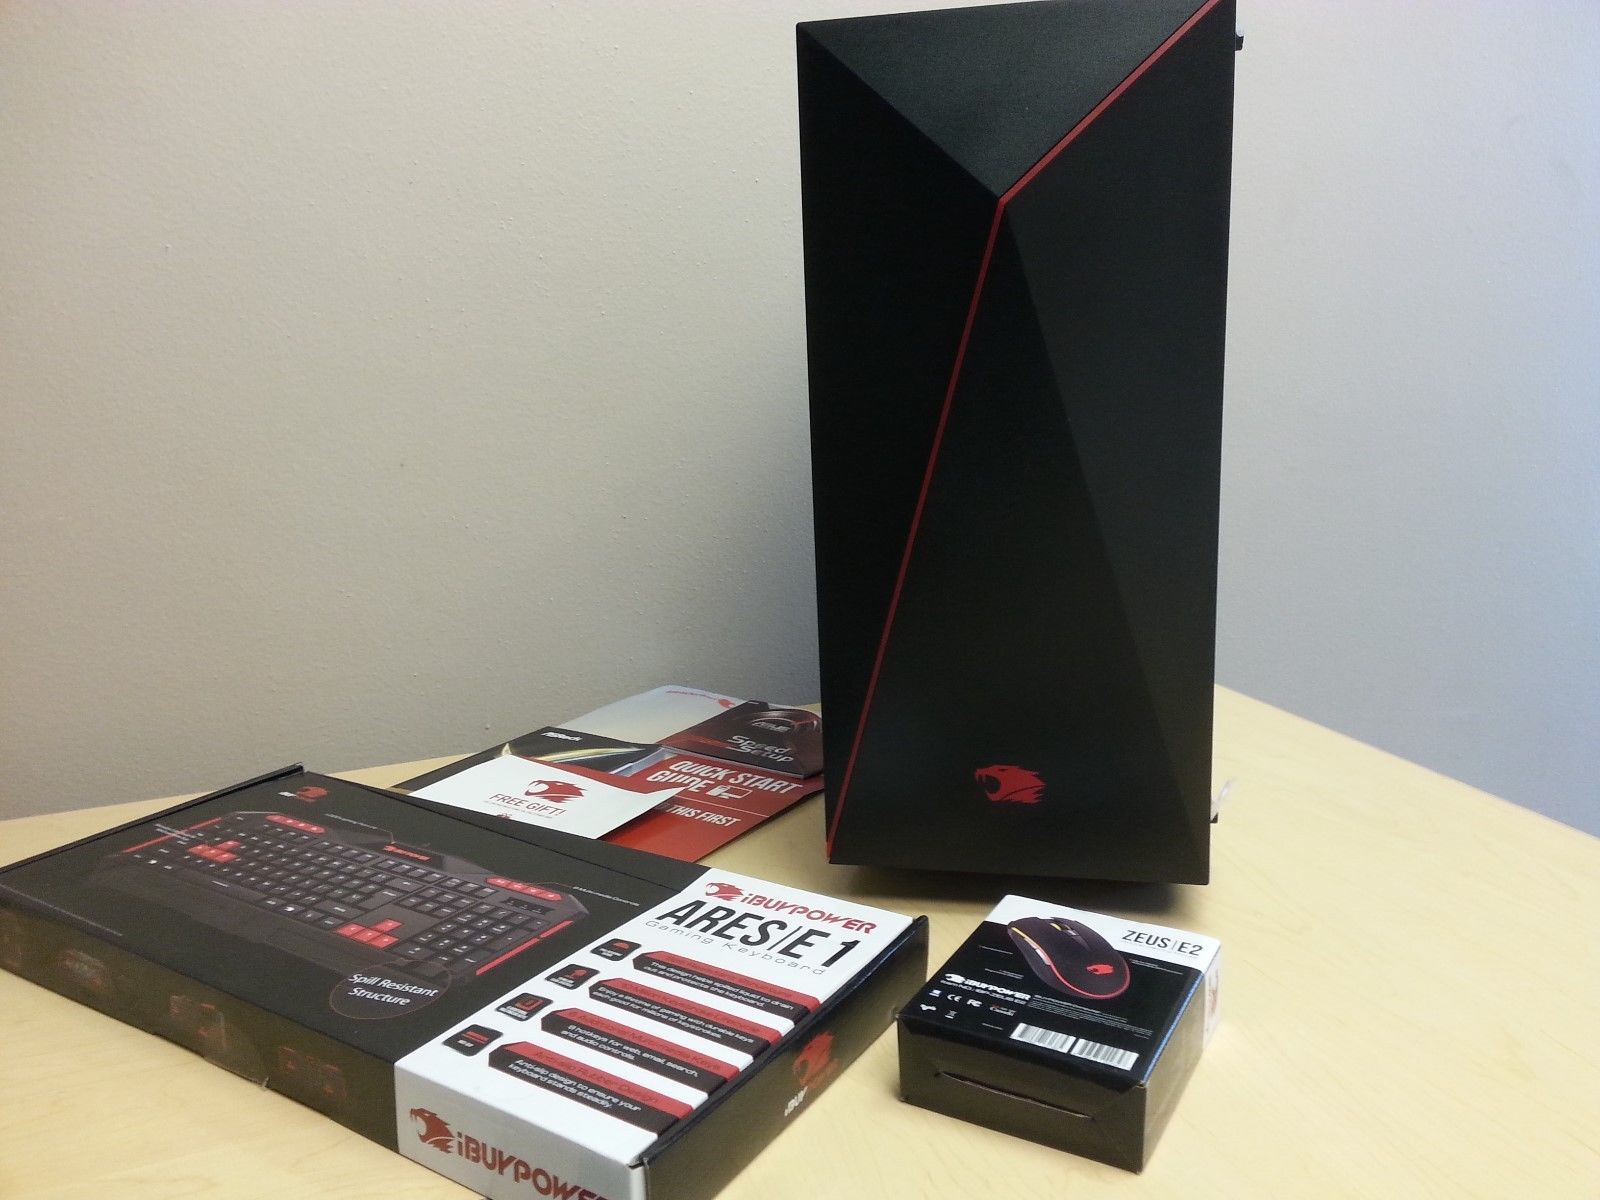 Ibuypower I Series 506 Amd Fx 6300 6 Core 350ghz 41ghz 12gb 1tb Processor Box